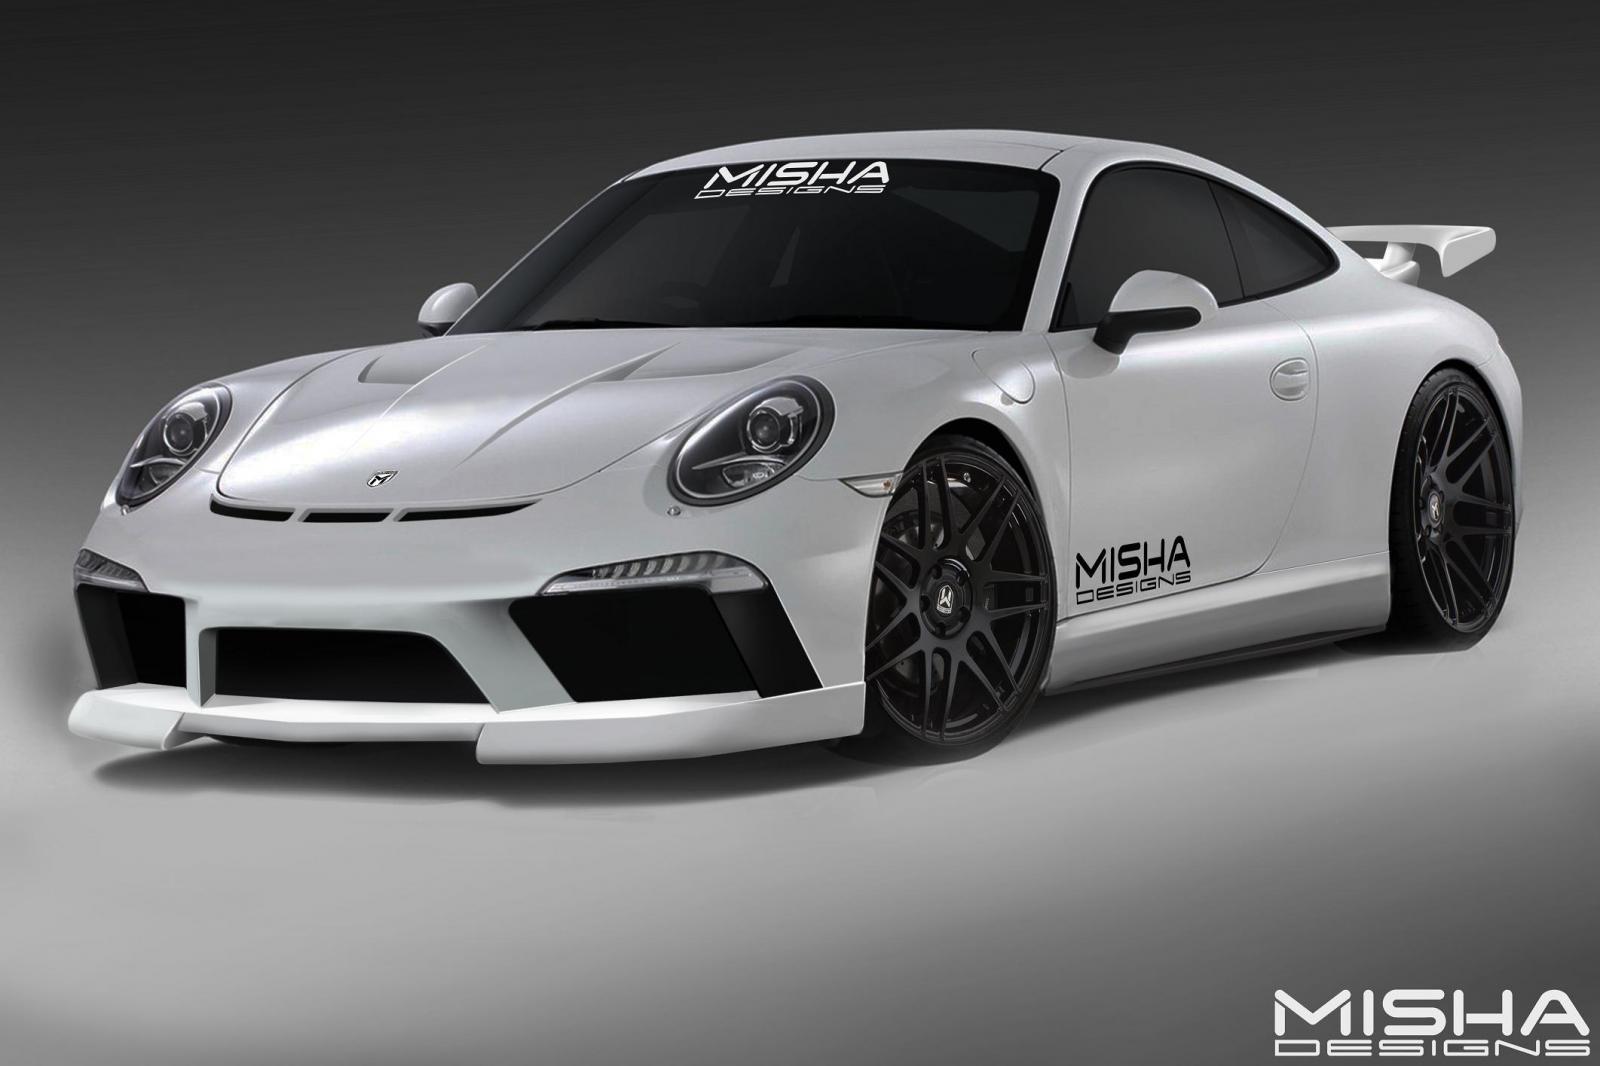 porsche cars news 911 body kit from misha design. Black Bedroom Furniture Sets. Home Design Ideas